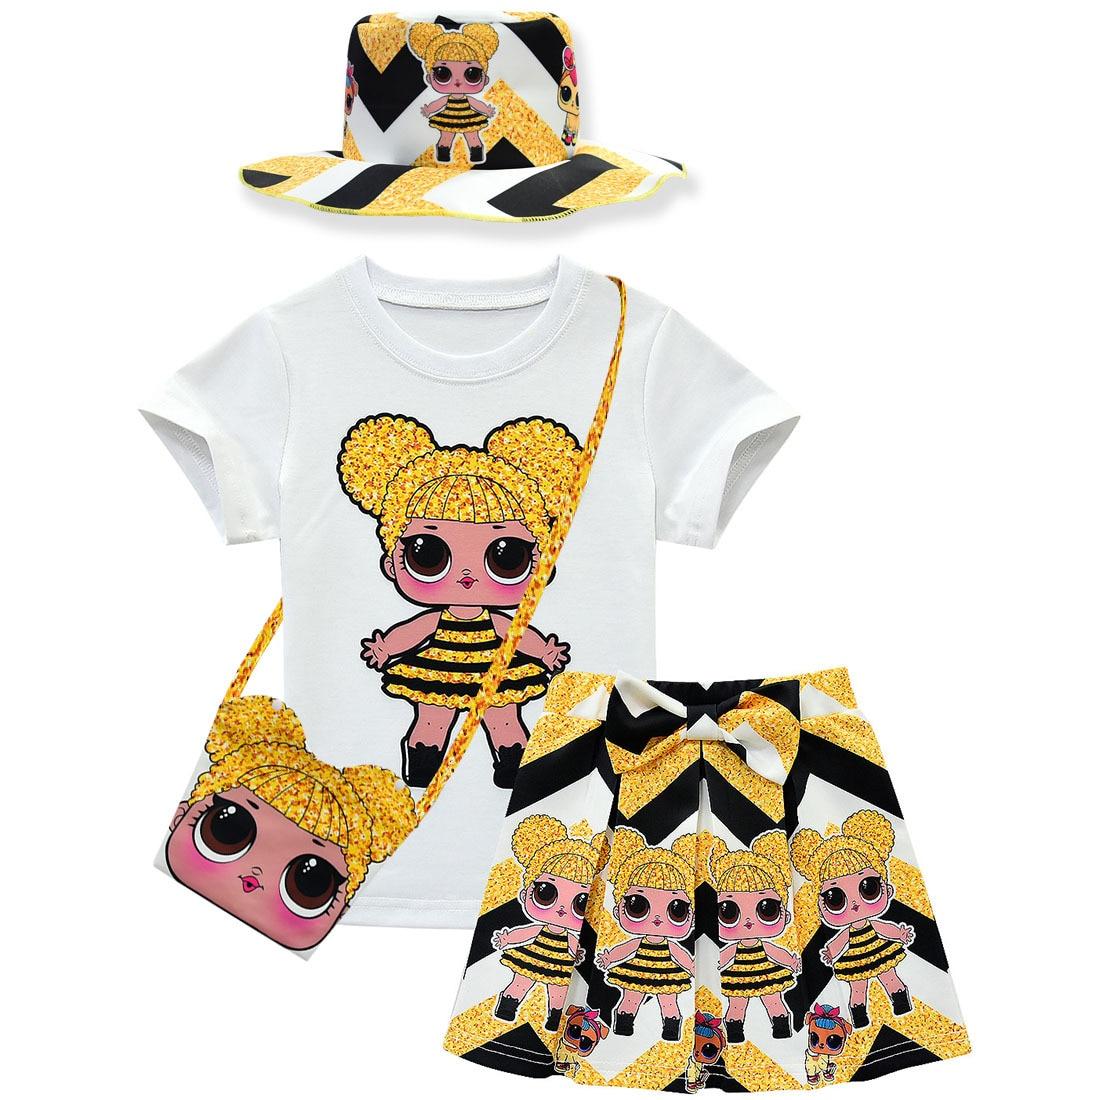 LOL Surprise T-Shirt and Leggings SetLOL Surprise Girls Outfit Set